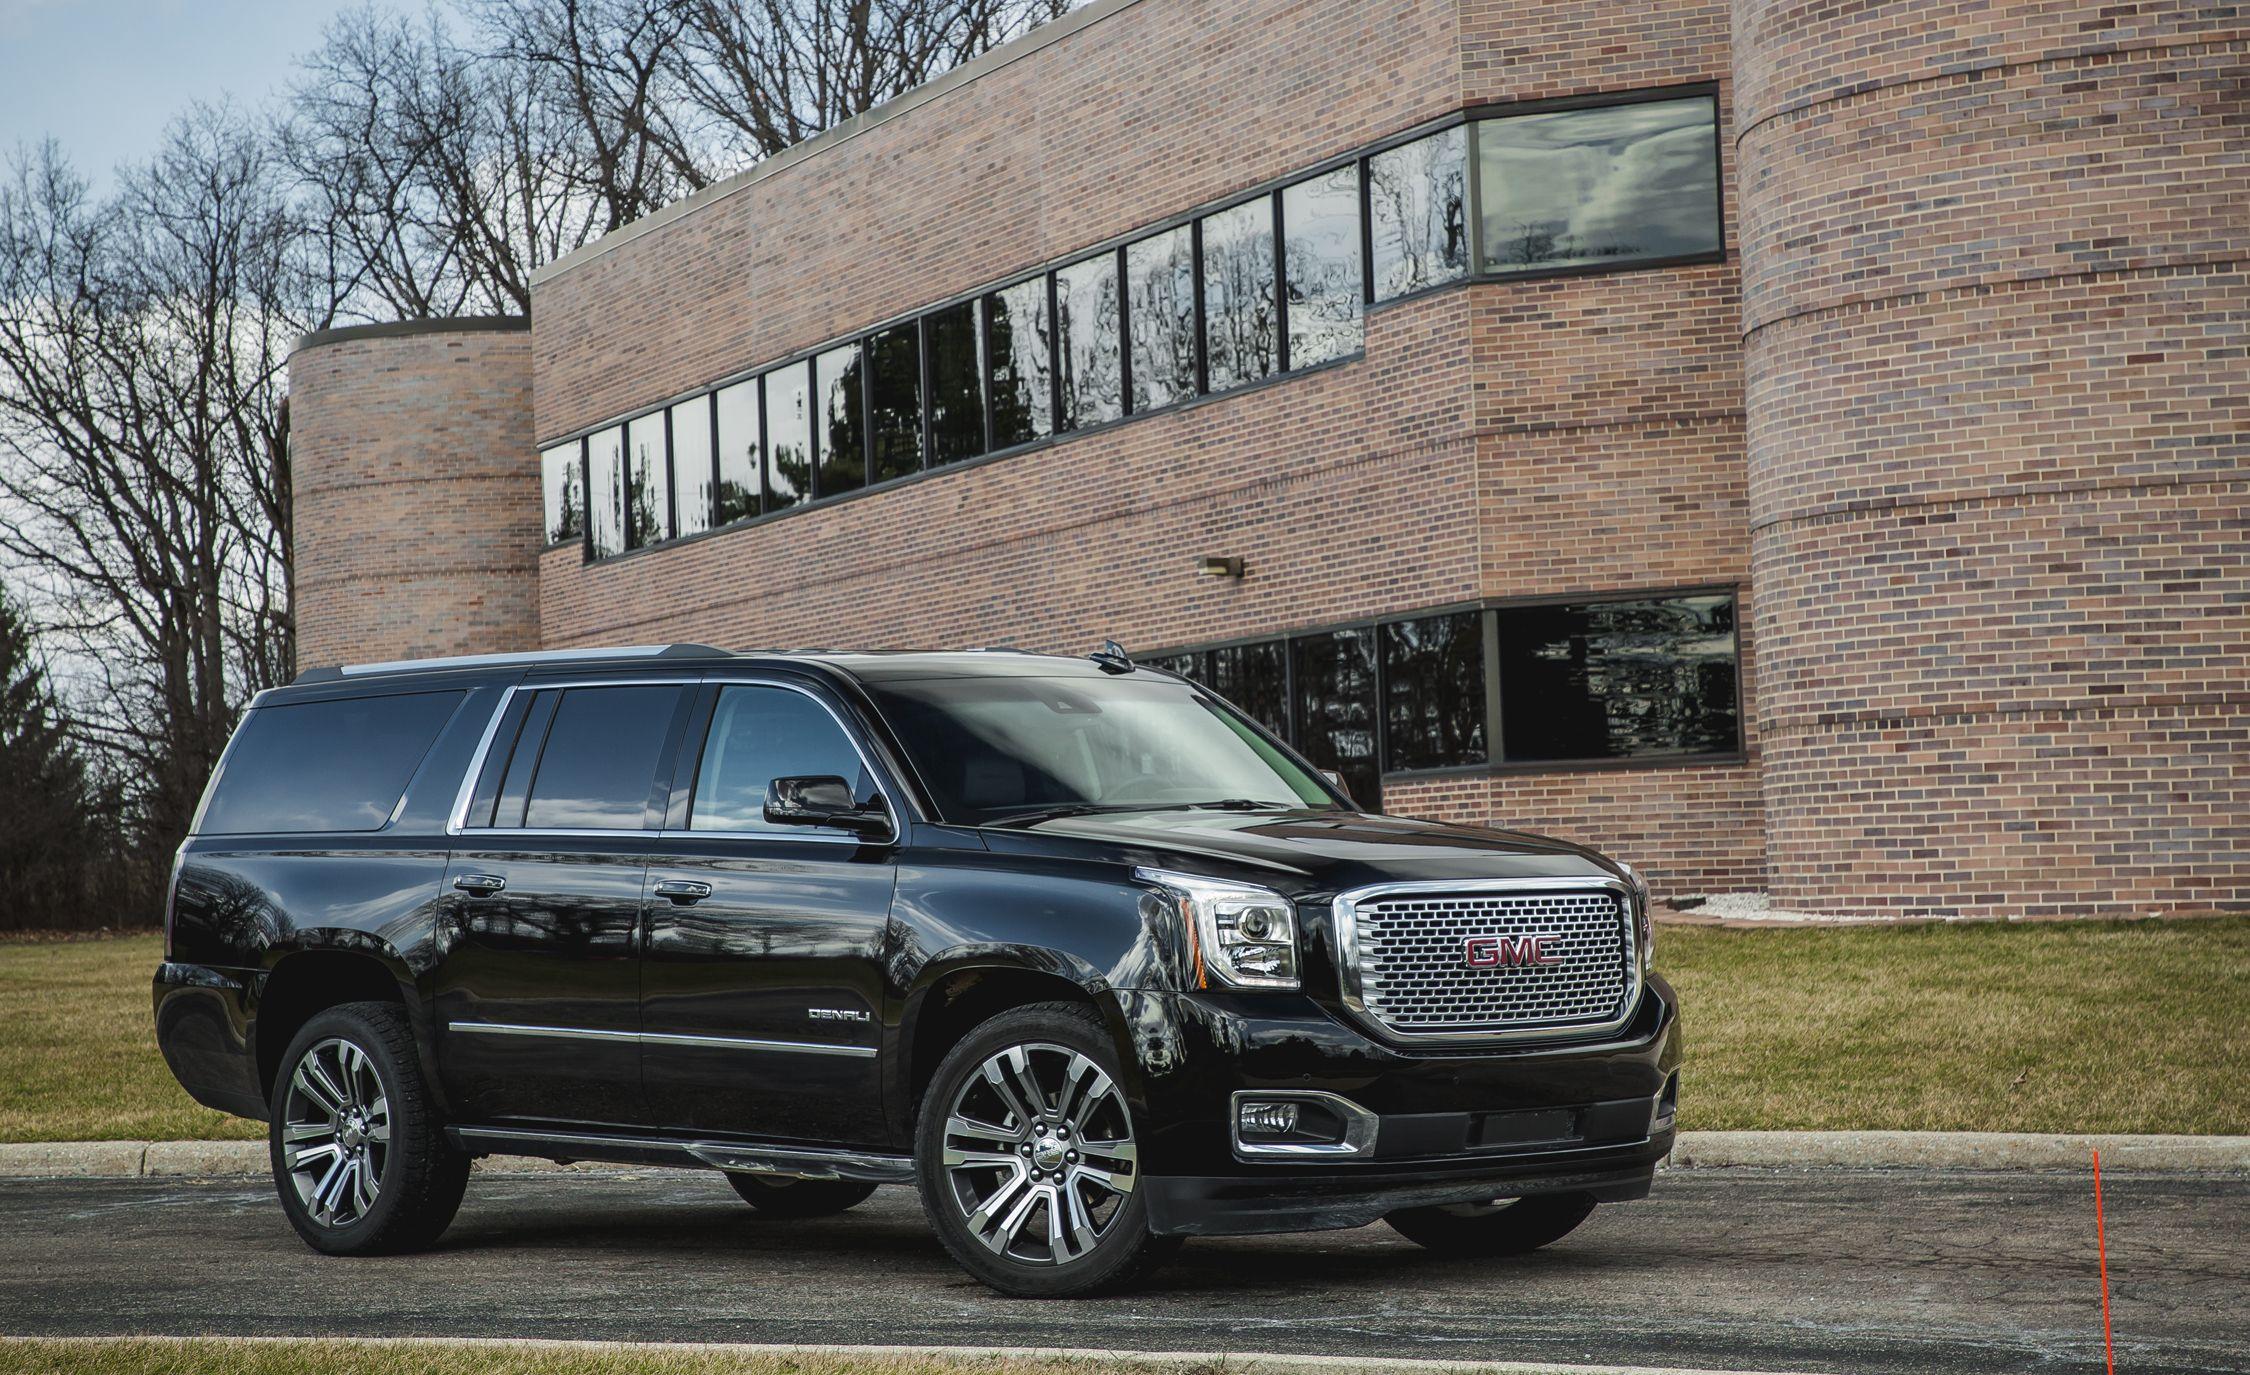 2017 GMC Yukon / Yukon XL | IntelliLink Infotainment Review | Car and Driver